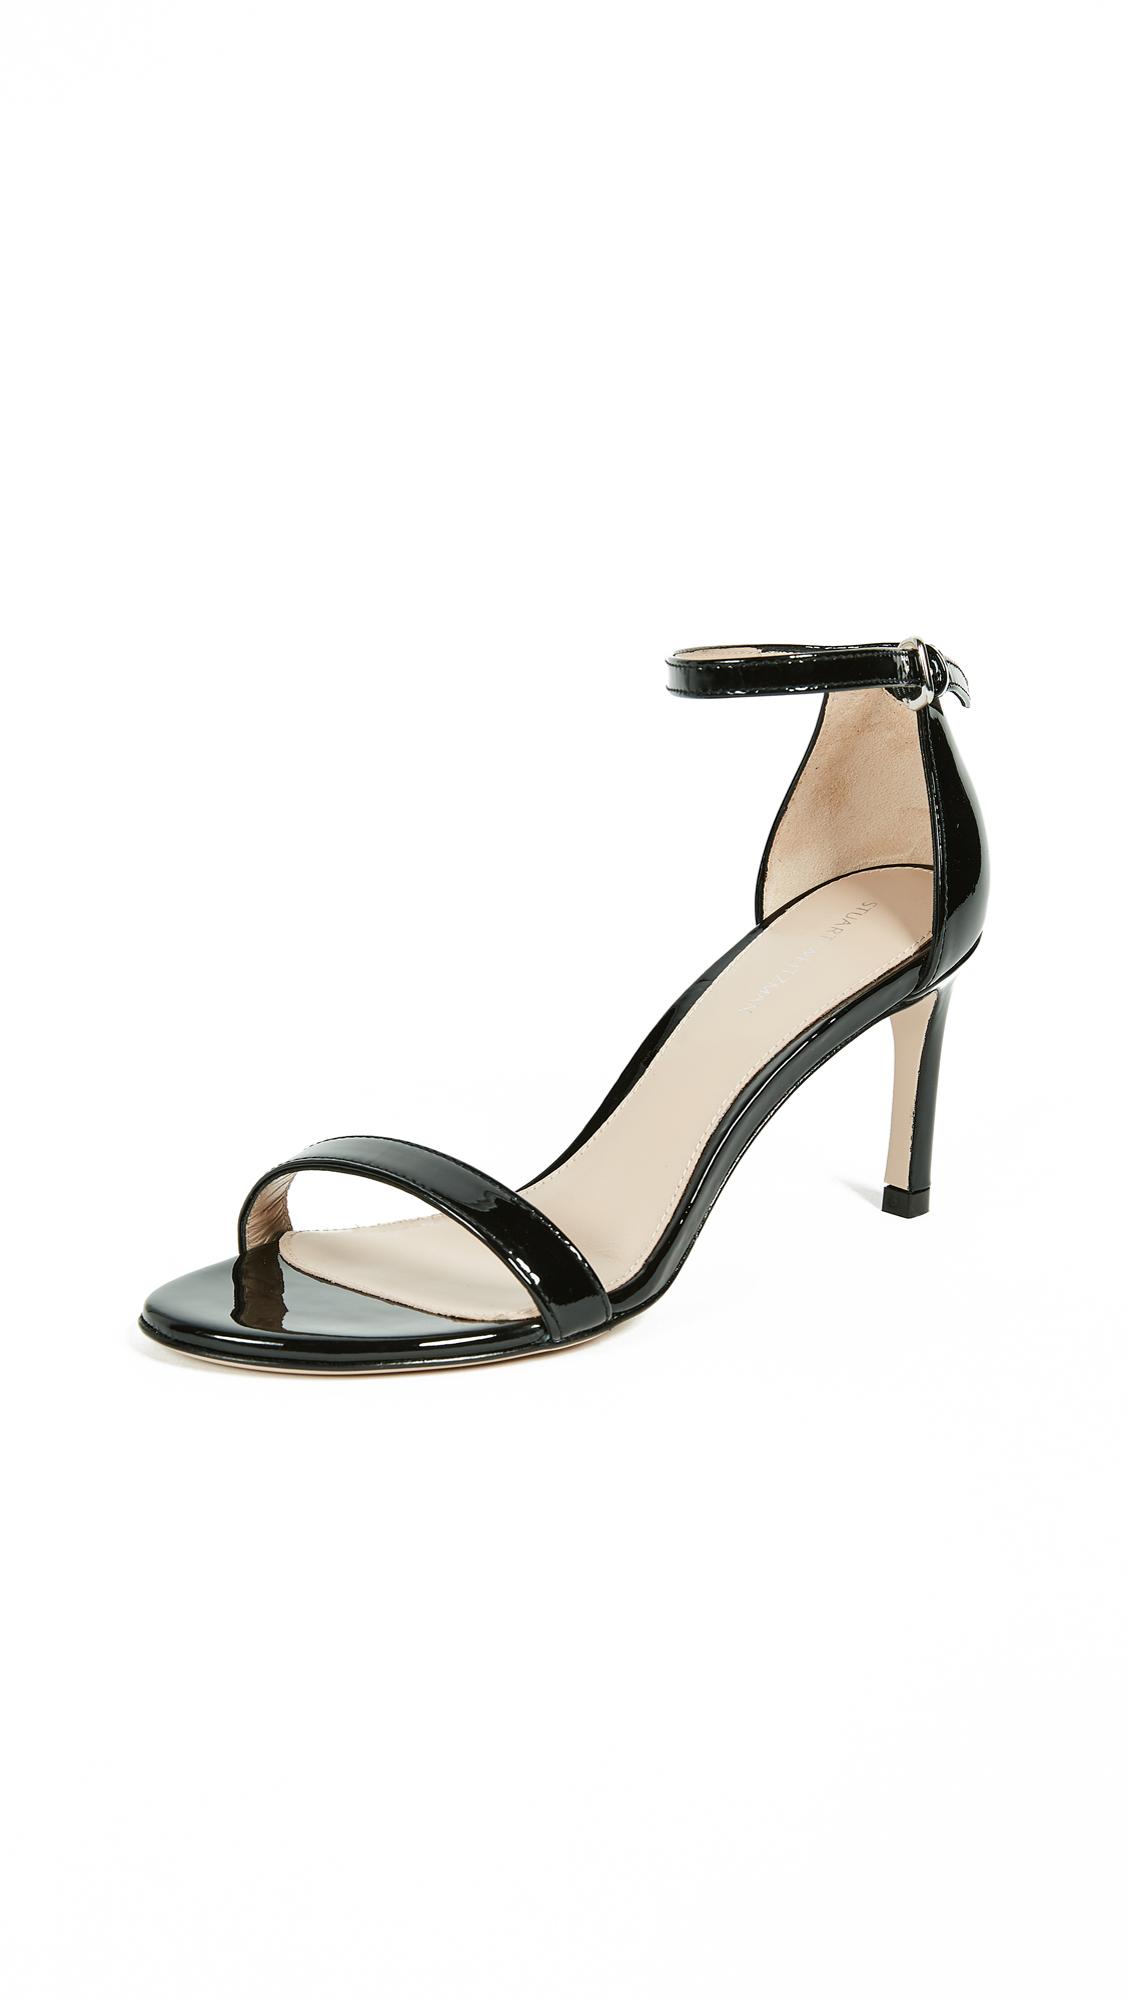 Stuart Weitzman Nunakedstraight Sandals - Black